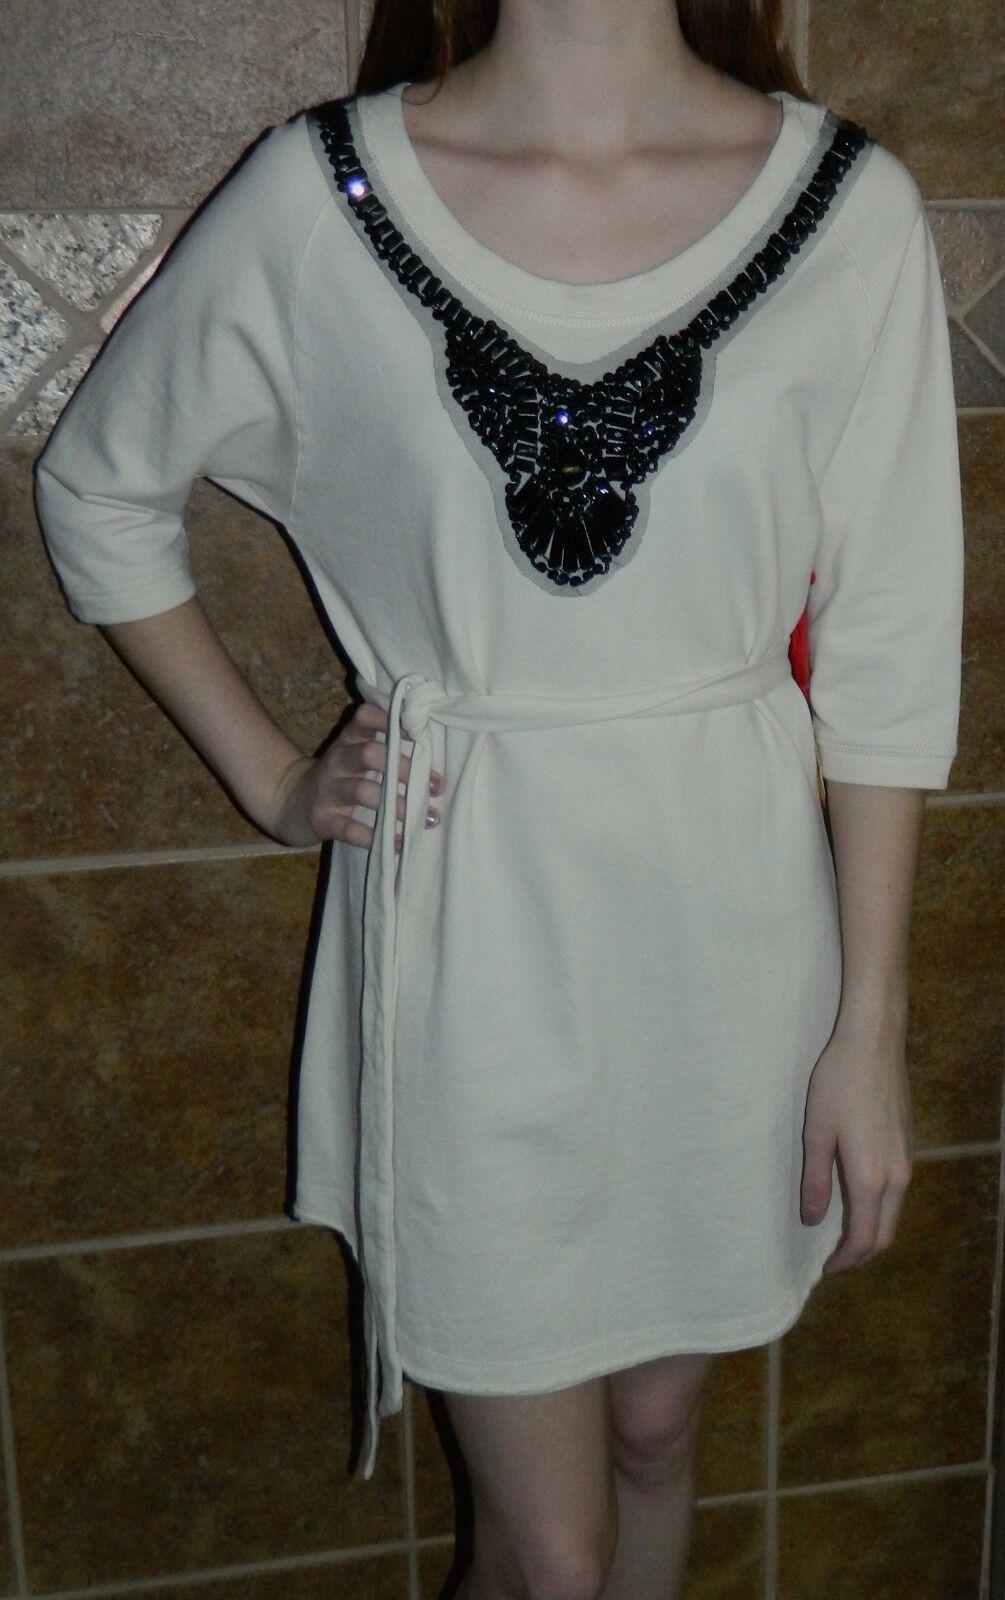 NWT Twisted Heart Beige schwarz Bead Jewel Tunic  Dress MSRP  Sz S, L